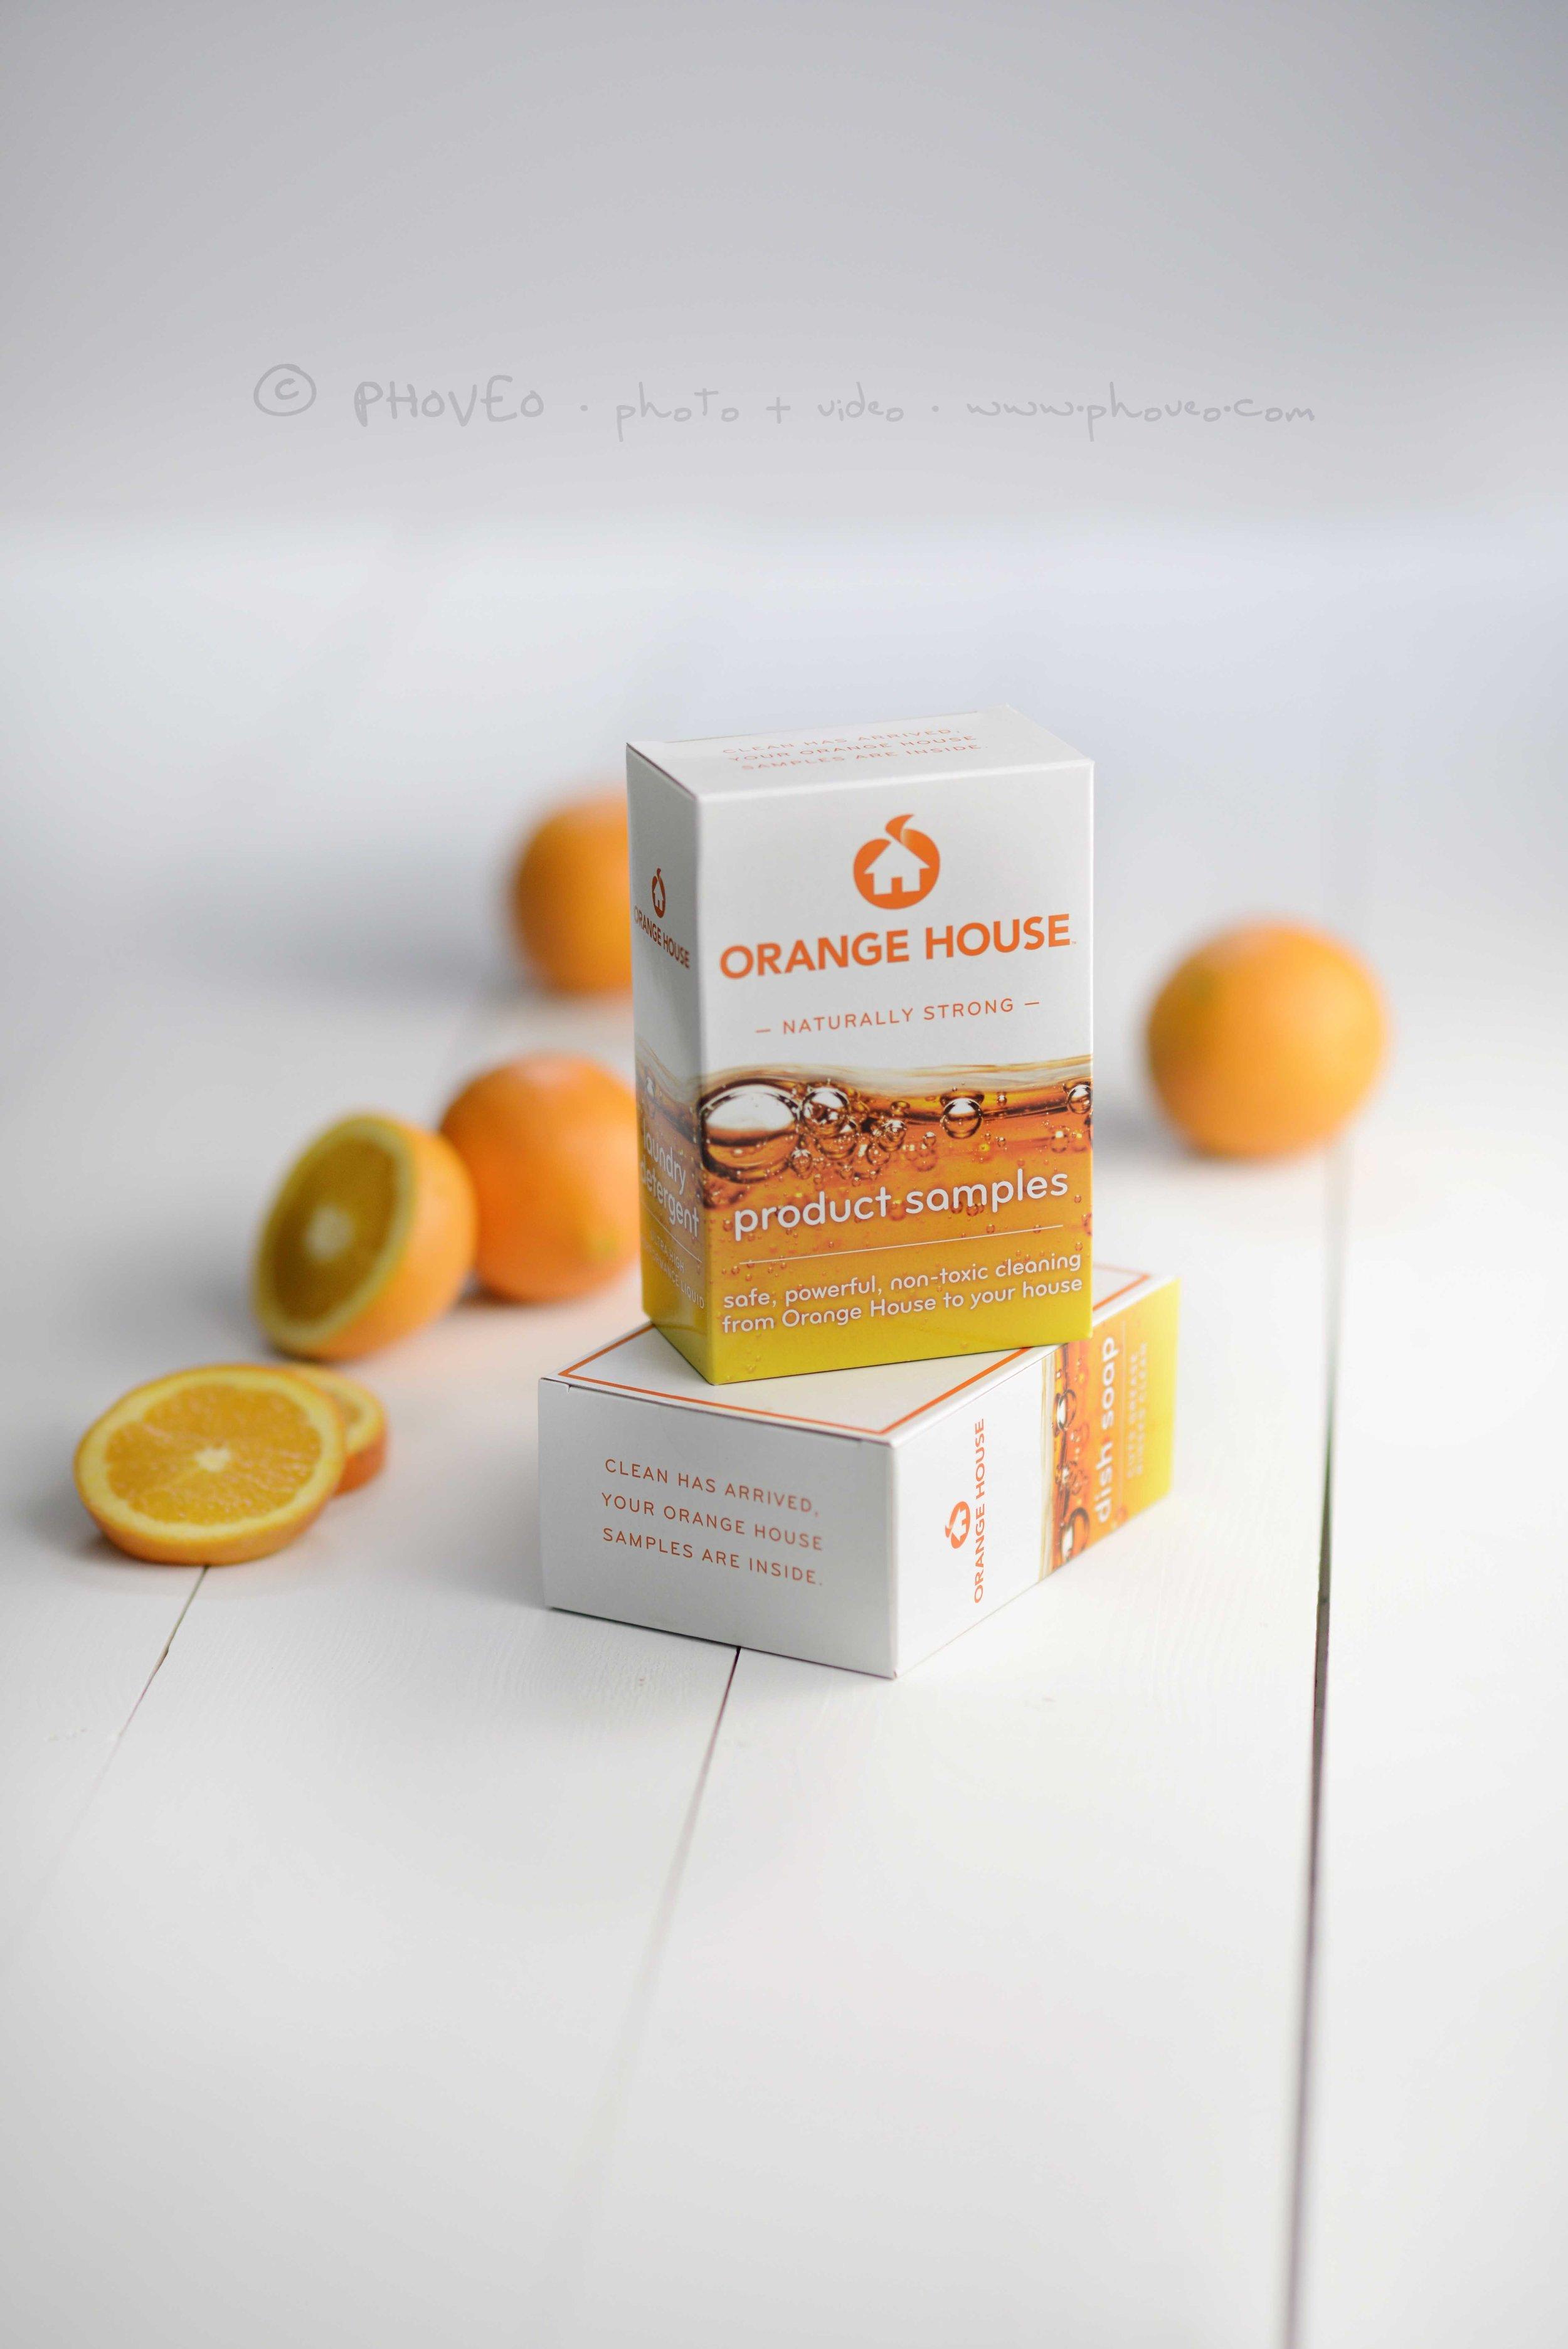 WM_20160825_OrangeHouse_264.jpg